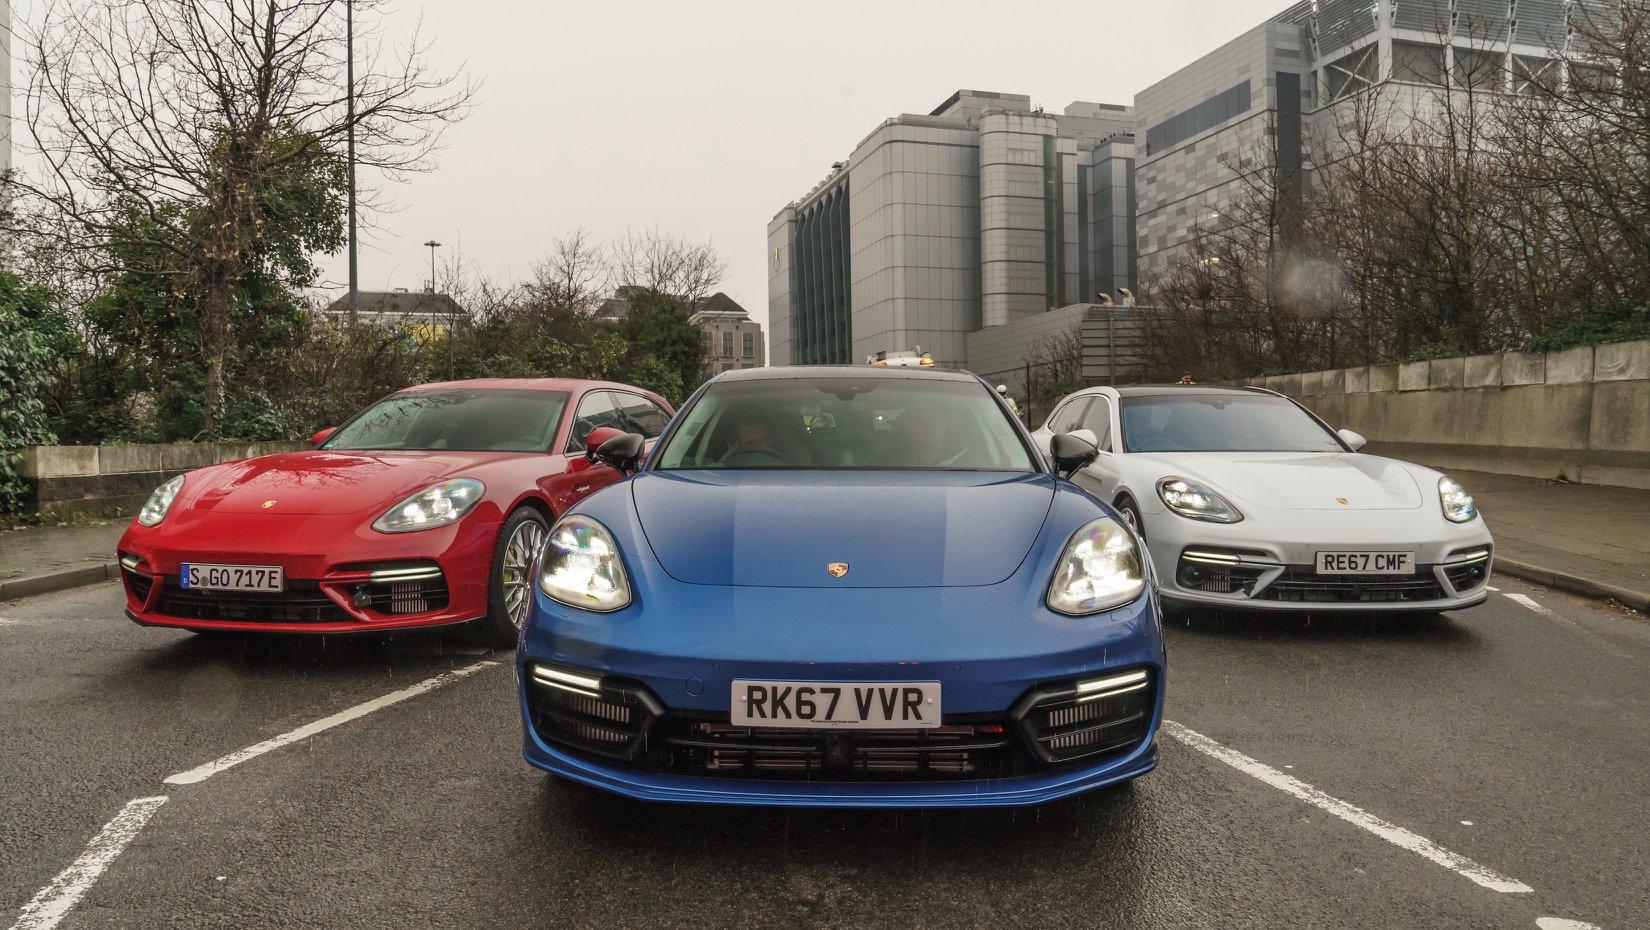 Porsche_Panamera_Turbo_Sport_Turismo_gold_tranposrt_0008